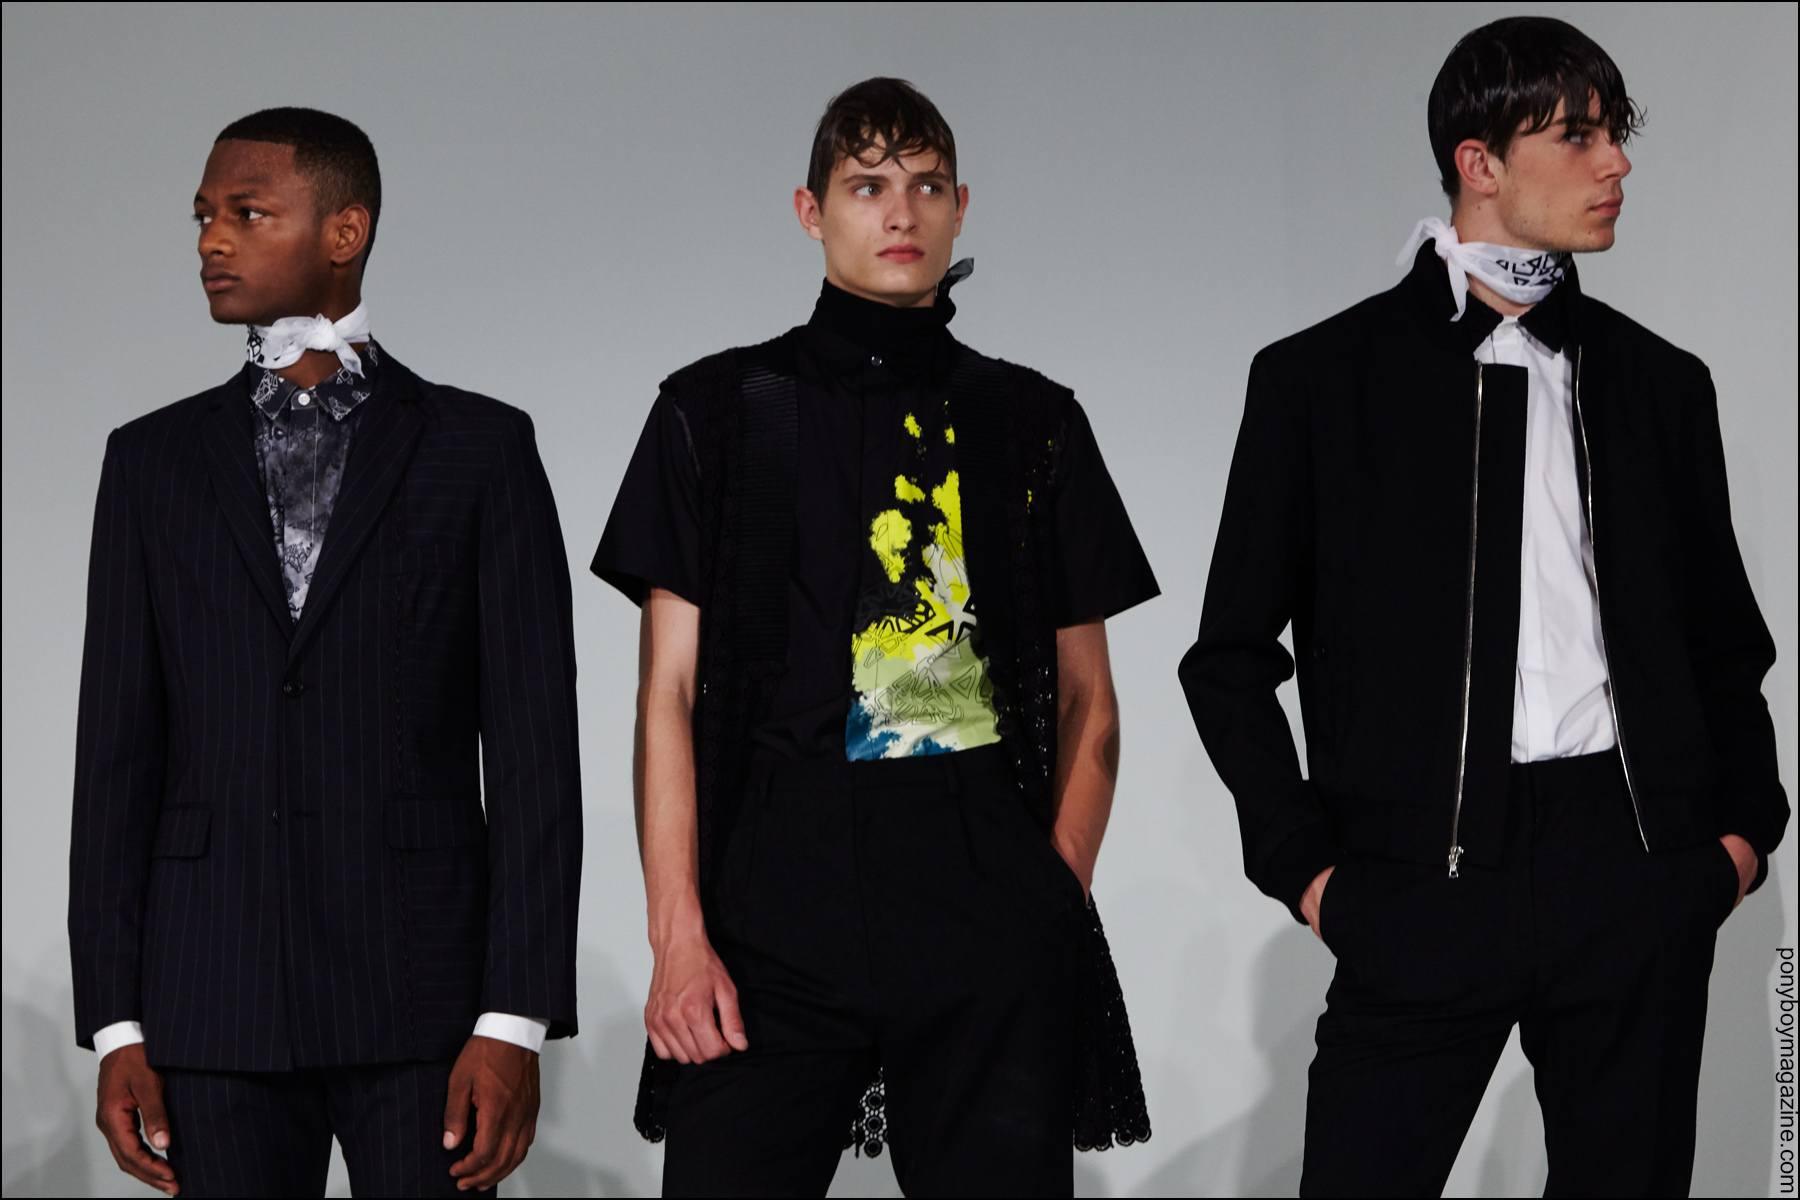 Male models photographed at New York Fashion Week Men's presentation by designer Kenneth Ning, Spring/Summer 2016. Photo by Alexander Thompson for Ponyboy magazine NY.